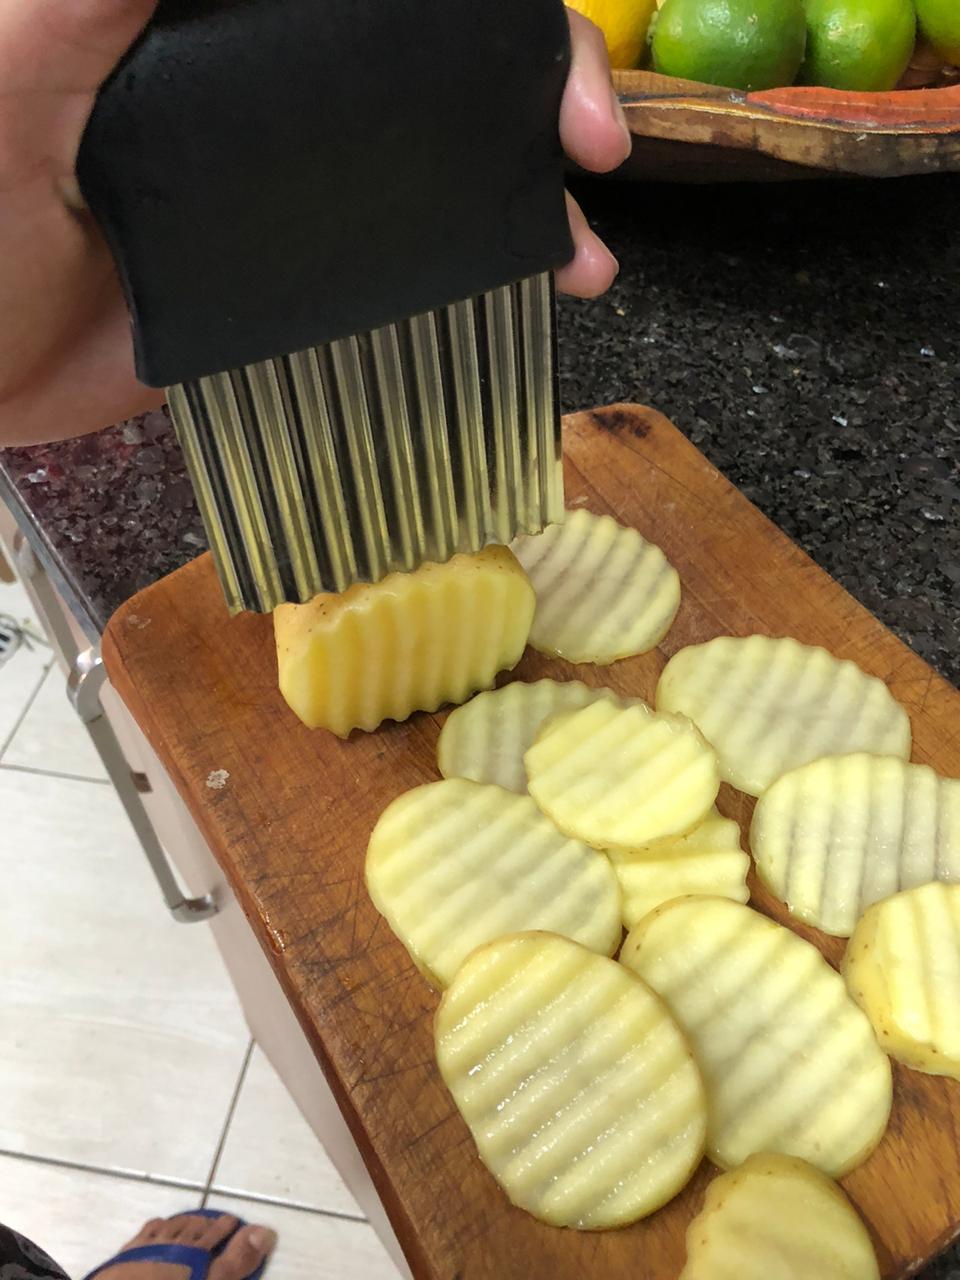 cortador ondulado fatiador de batata chips legumes em aço inox